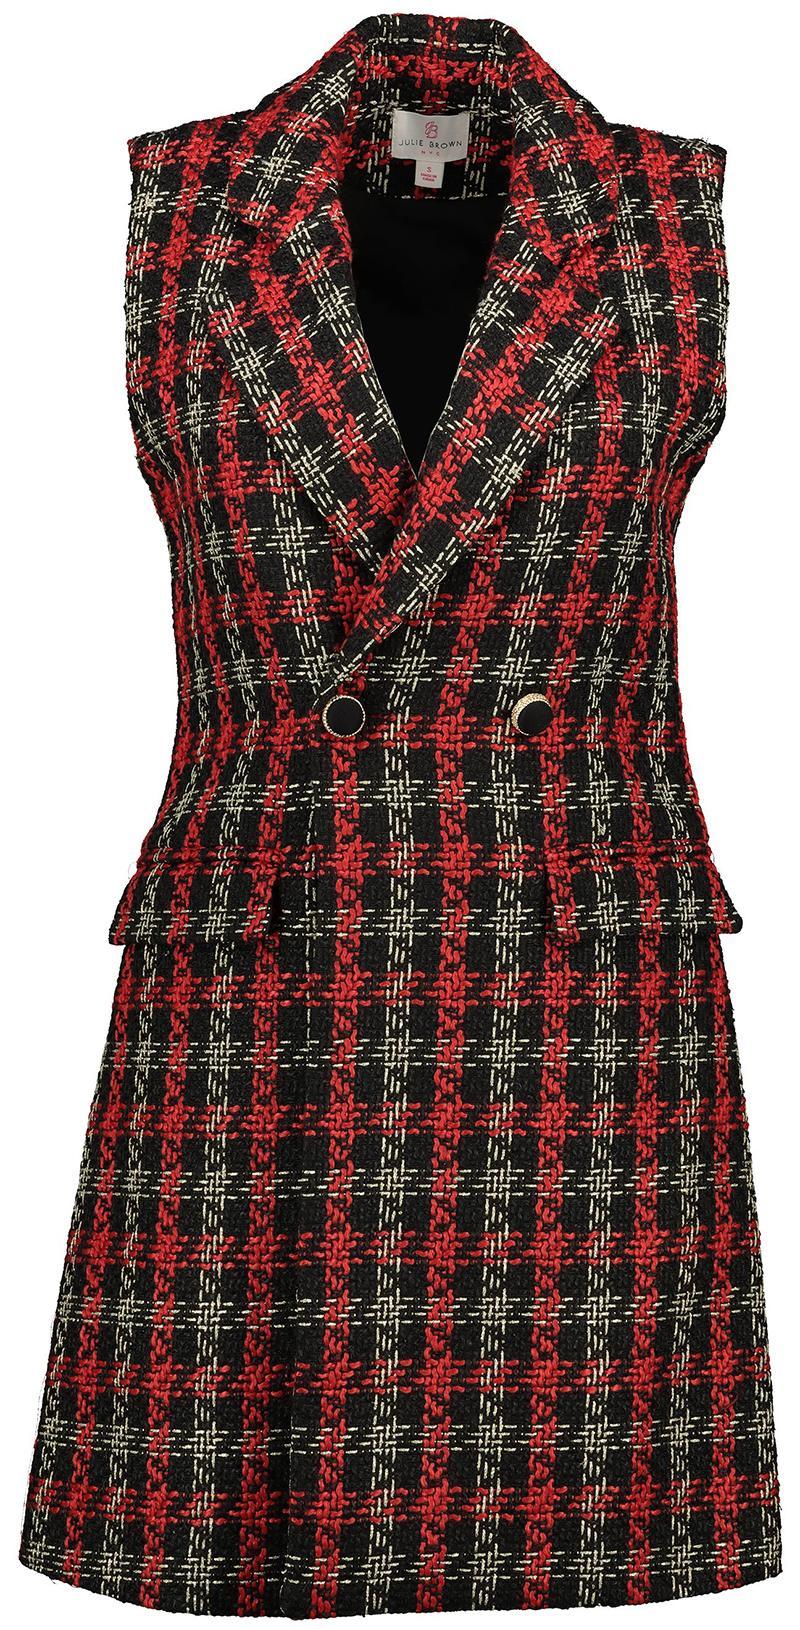 Sleeveless River Dress